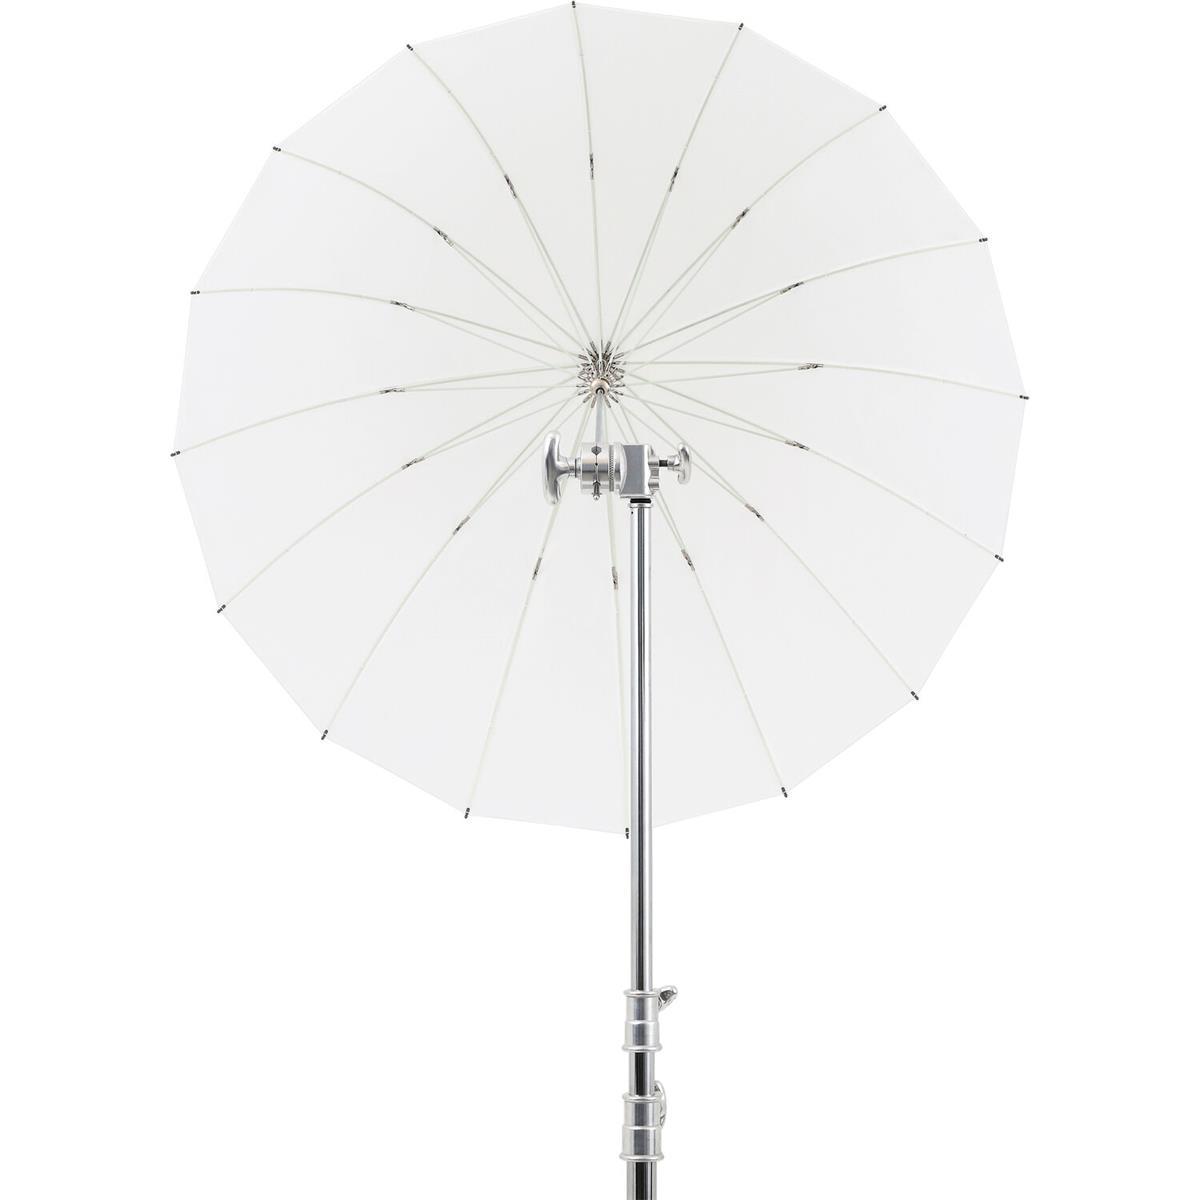 Godox 165 cm Parabolschirm translucent UB-165D